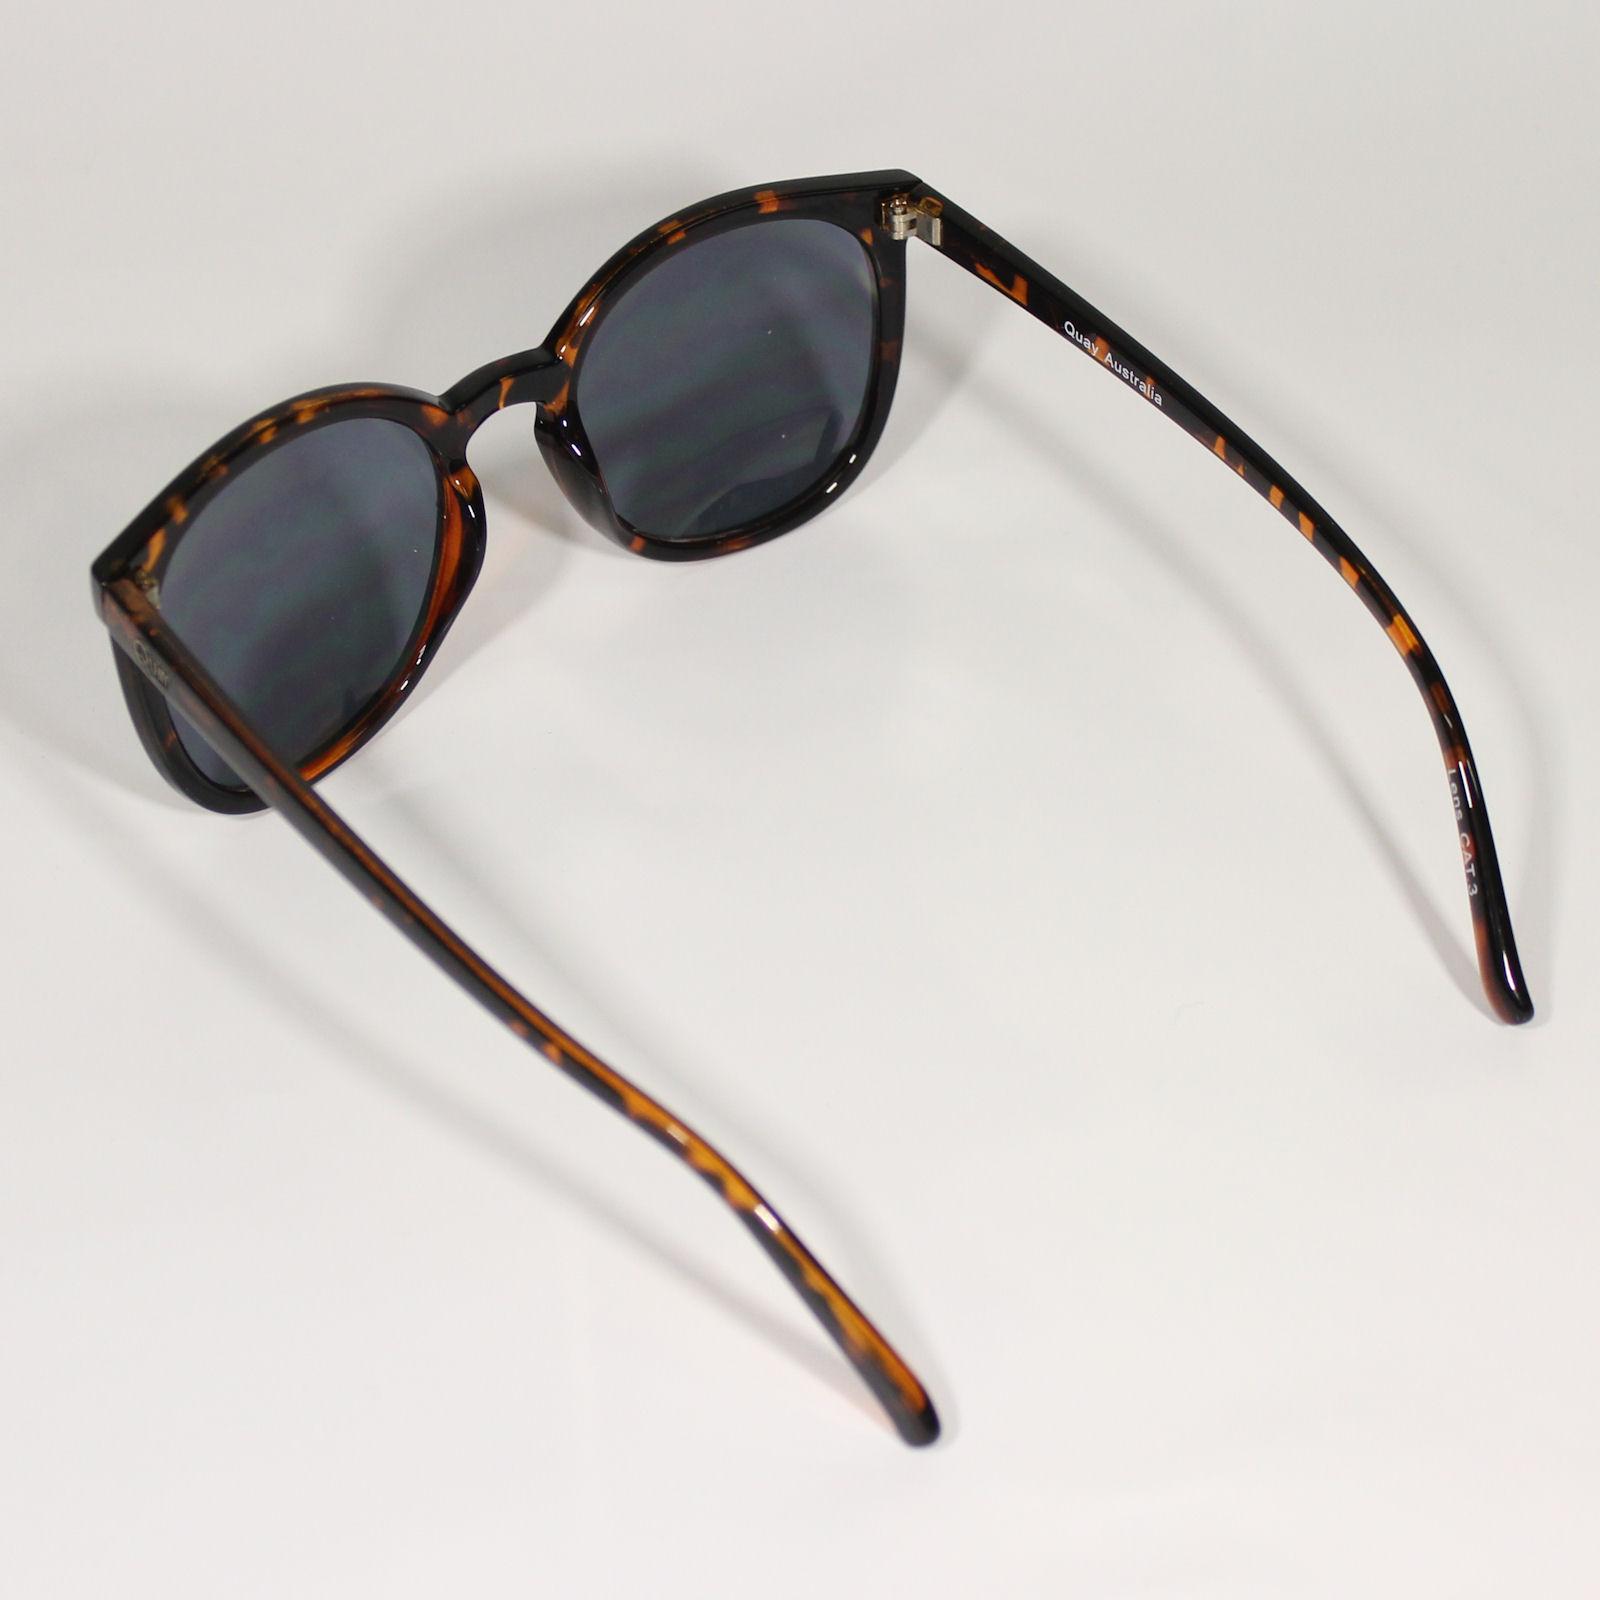 QUAY Australia Damen Sonnenbrille DIXI GOLD brown CmM46nCTa